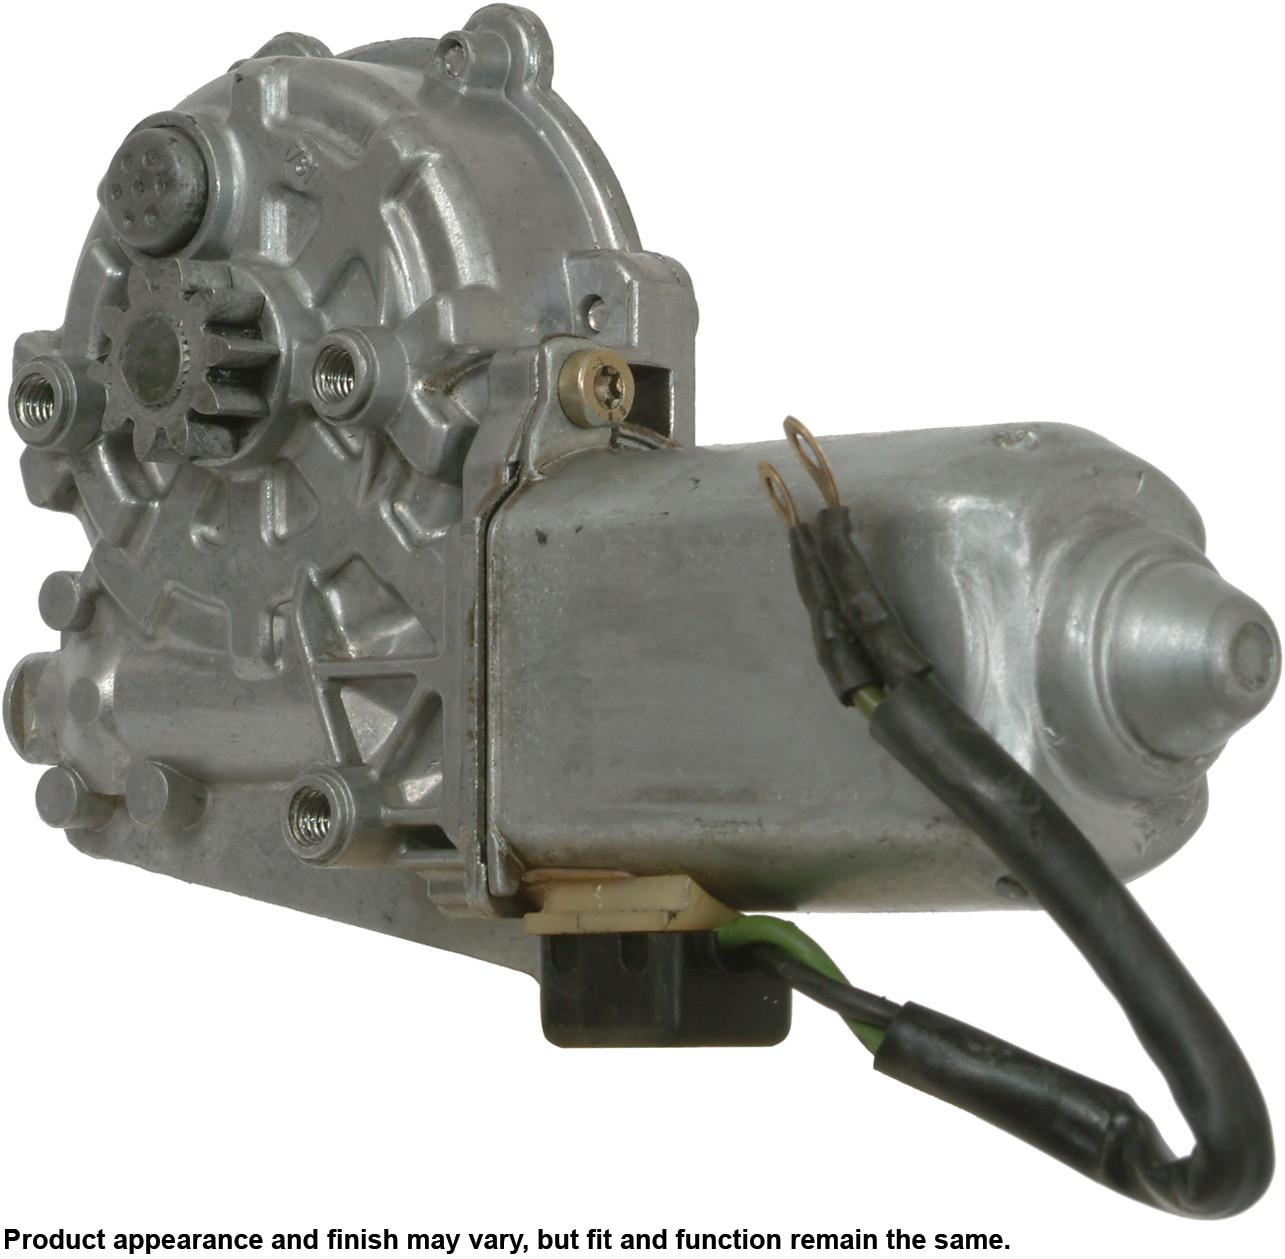 Imagen de Motor de Ventana eléctrica para Mercedes-Benz 190E 1986 1989 Marca CARDONE Remanufacturado Número de Parte 47-34001